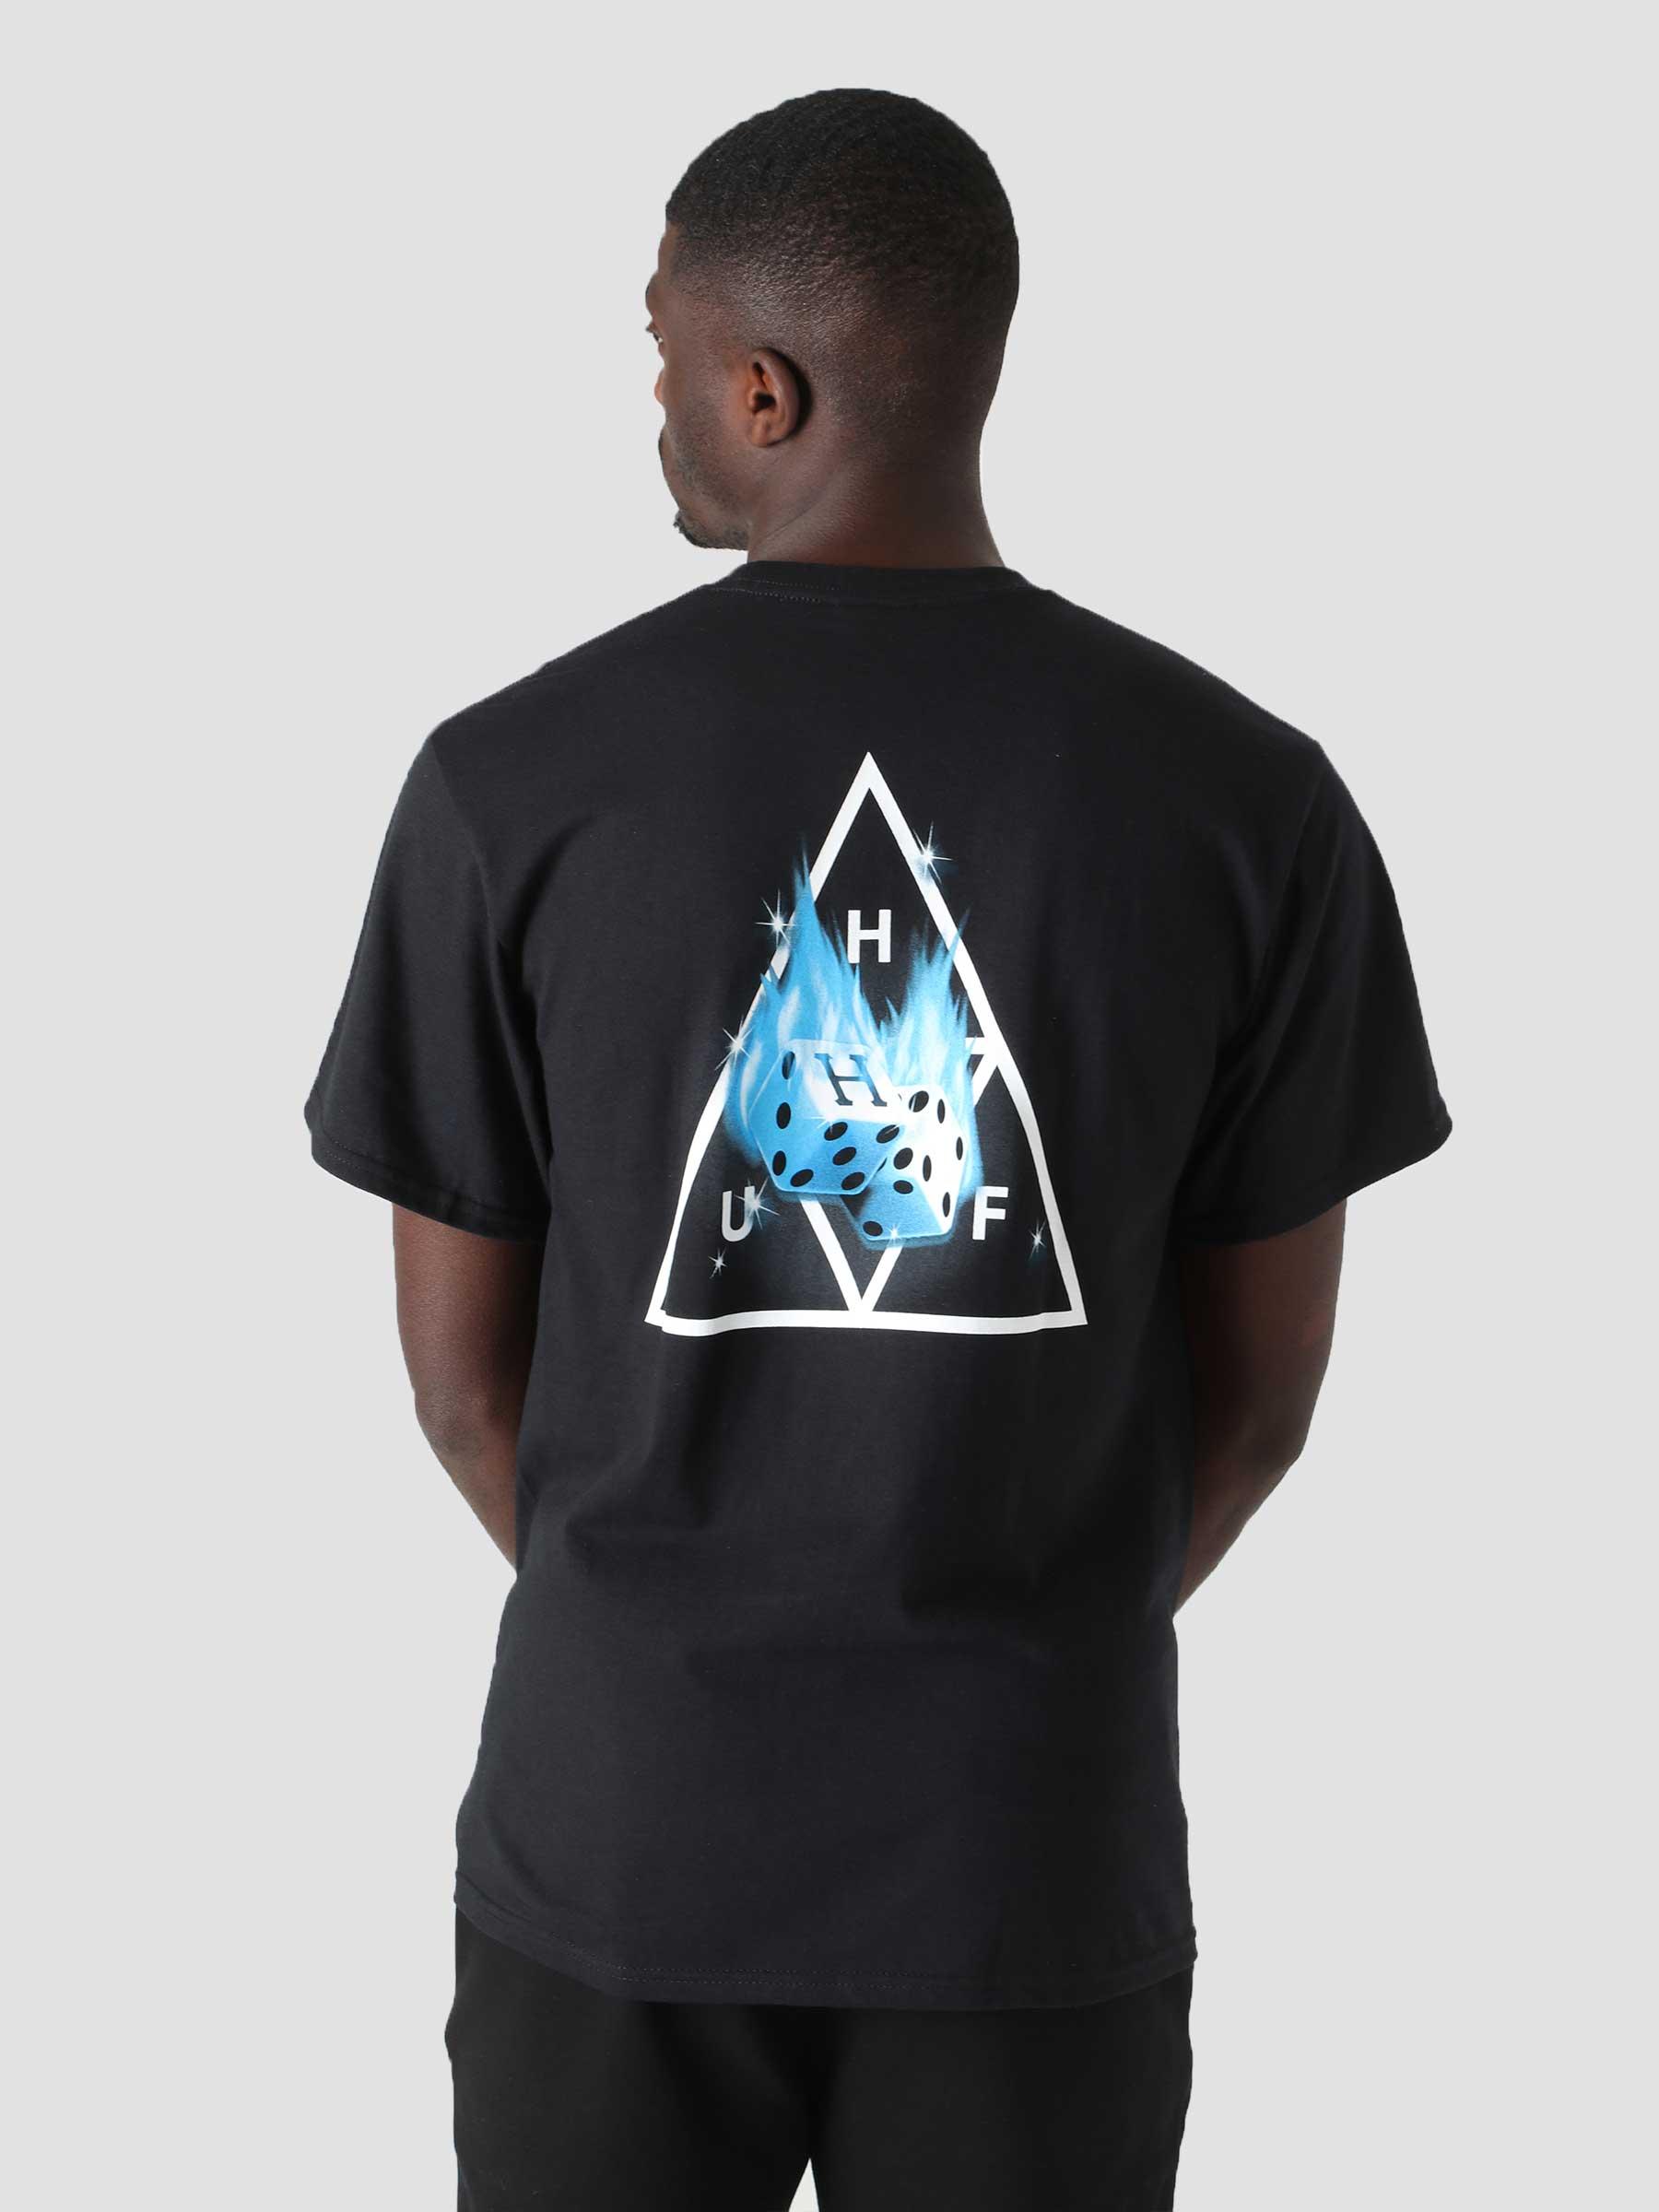 Hot Dice TT T-Shirt Black TS01498-BLACK